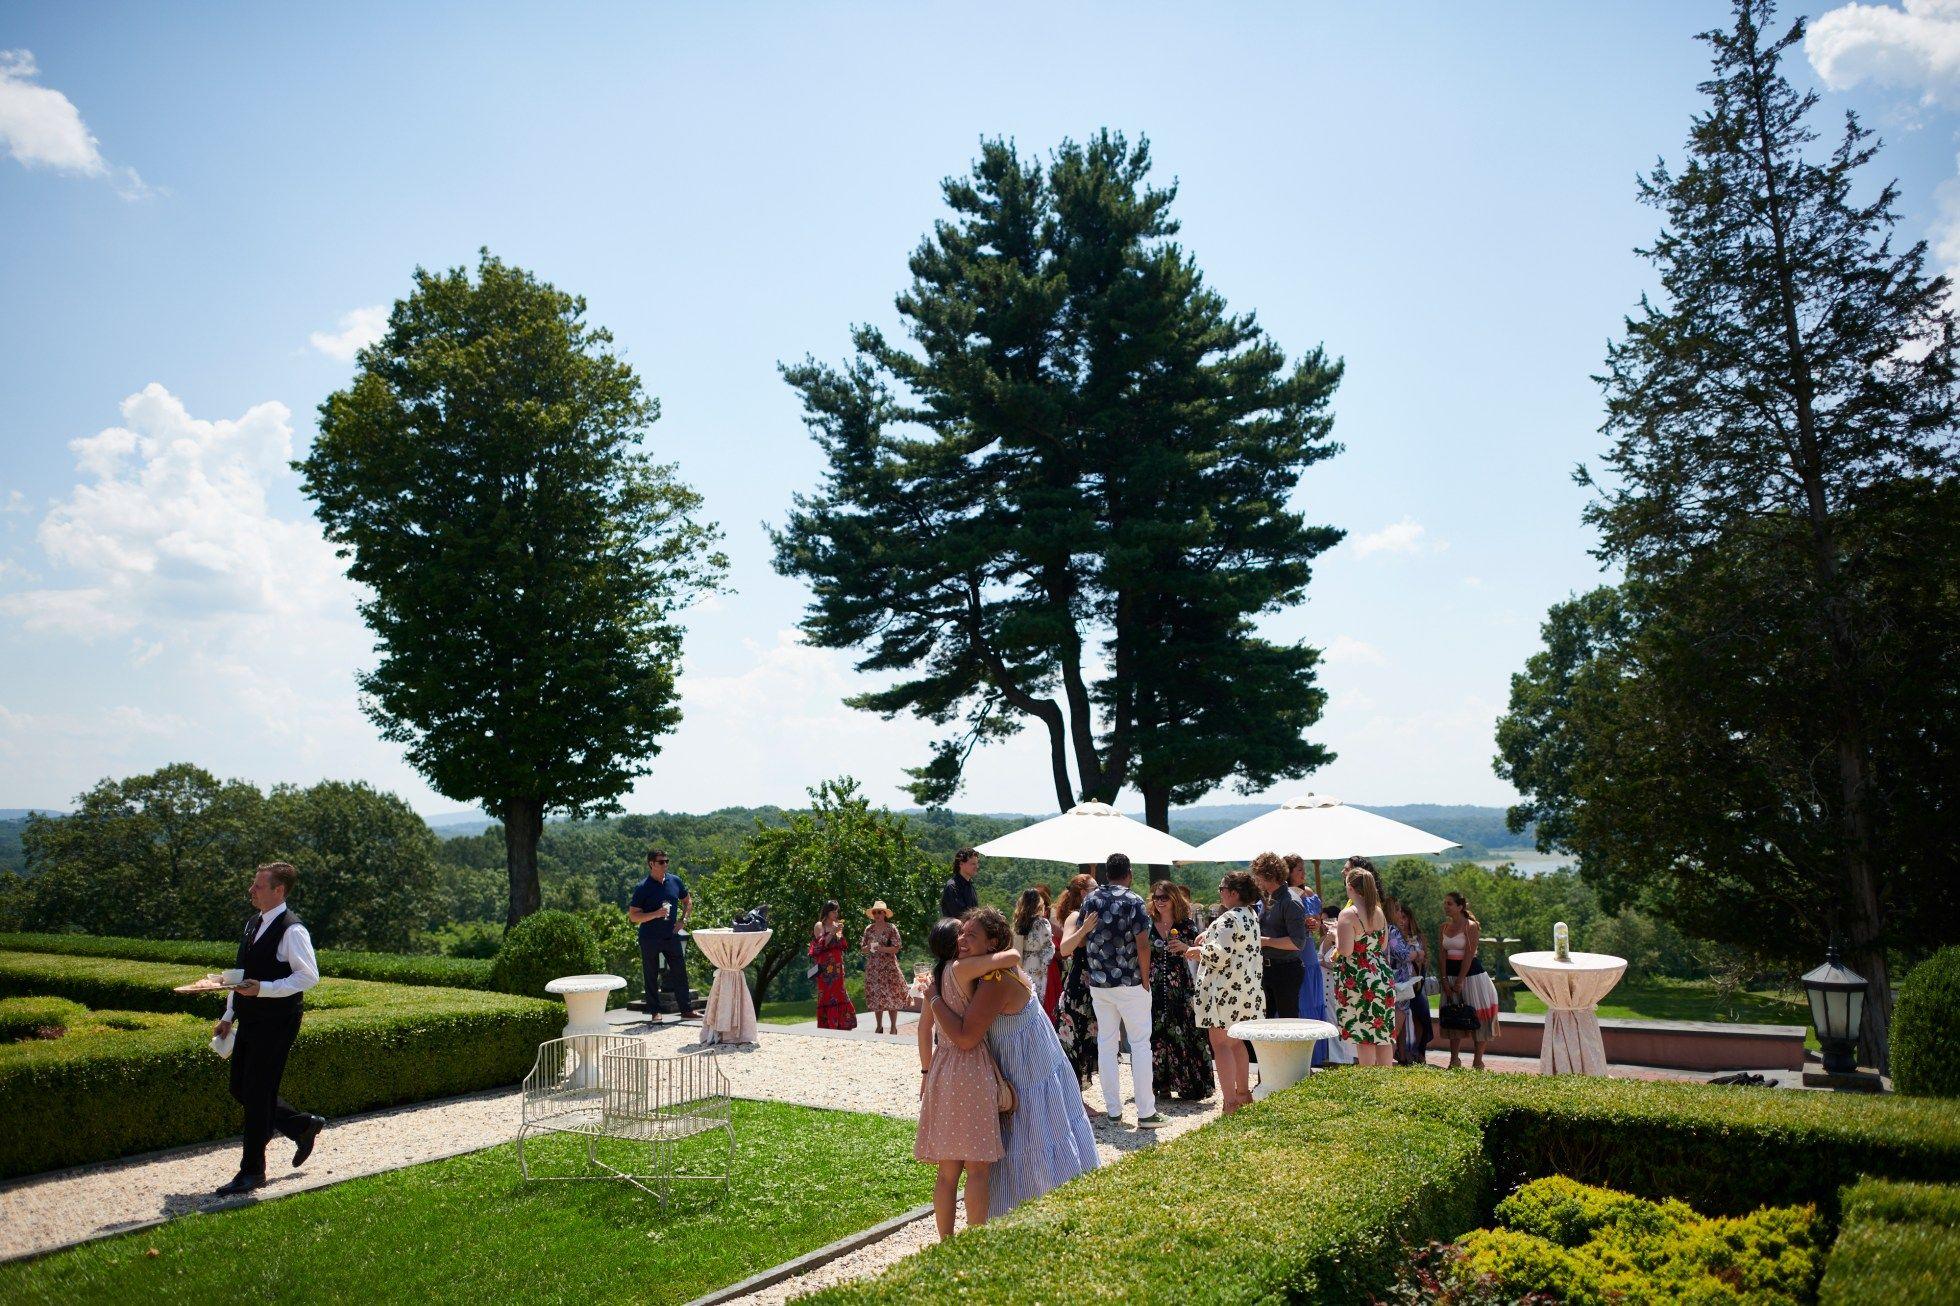 On location the glenmere mansion party rental ltd blog